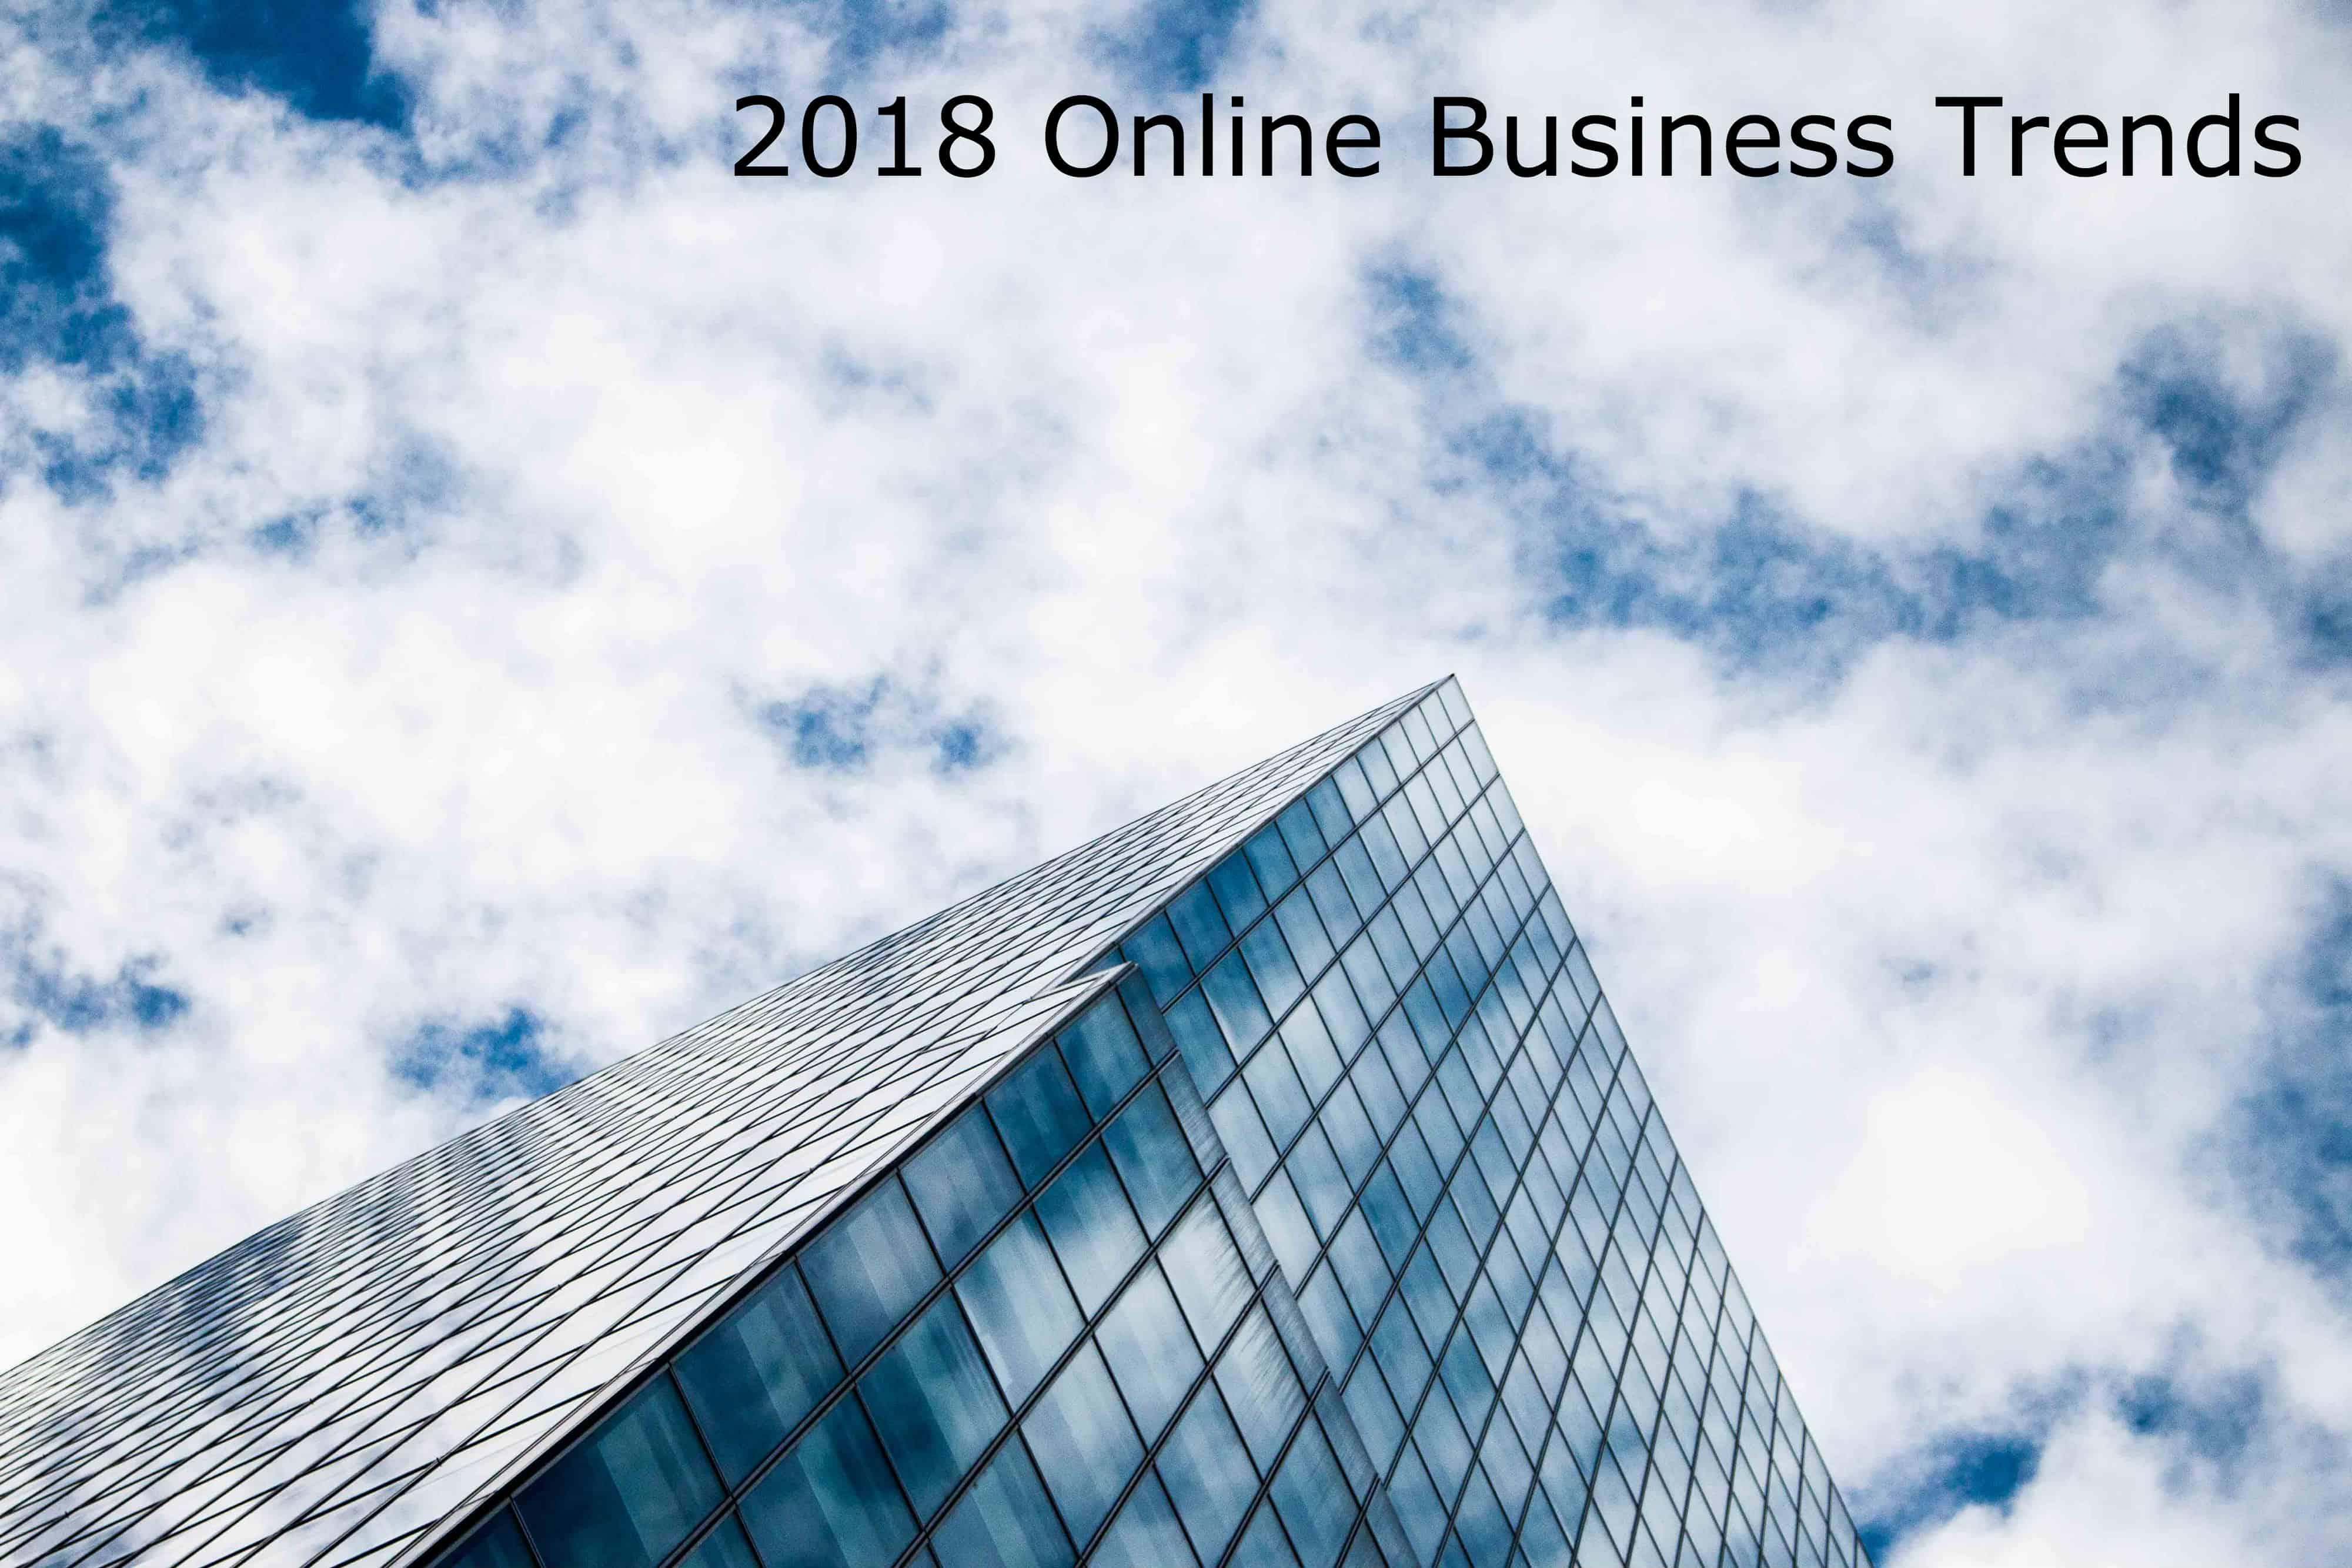 2018 Online Business Trends